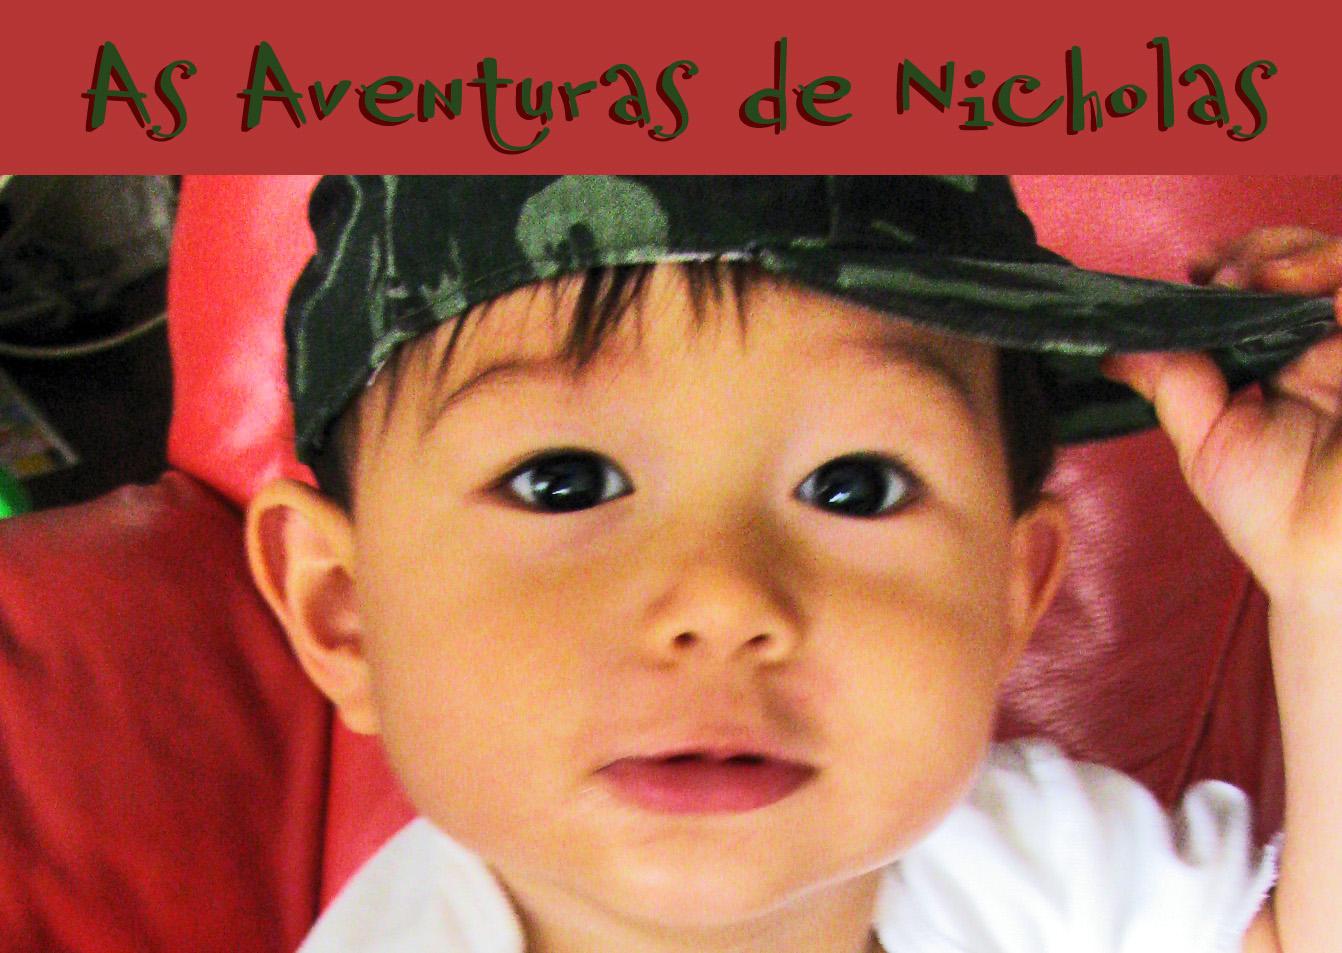 AS AVENTURAS DE NICHOLAS